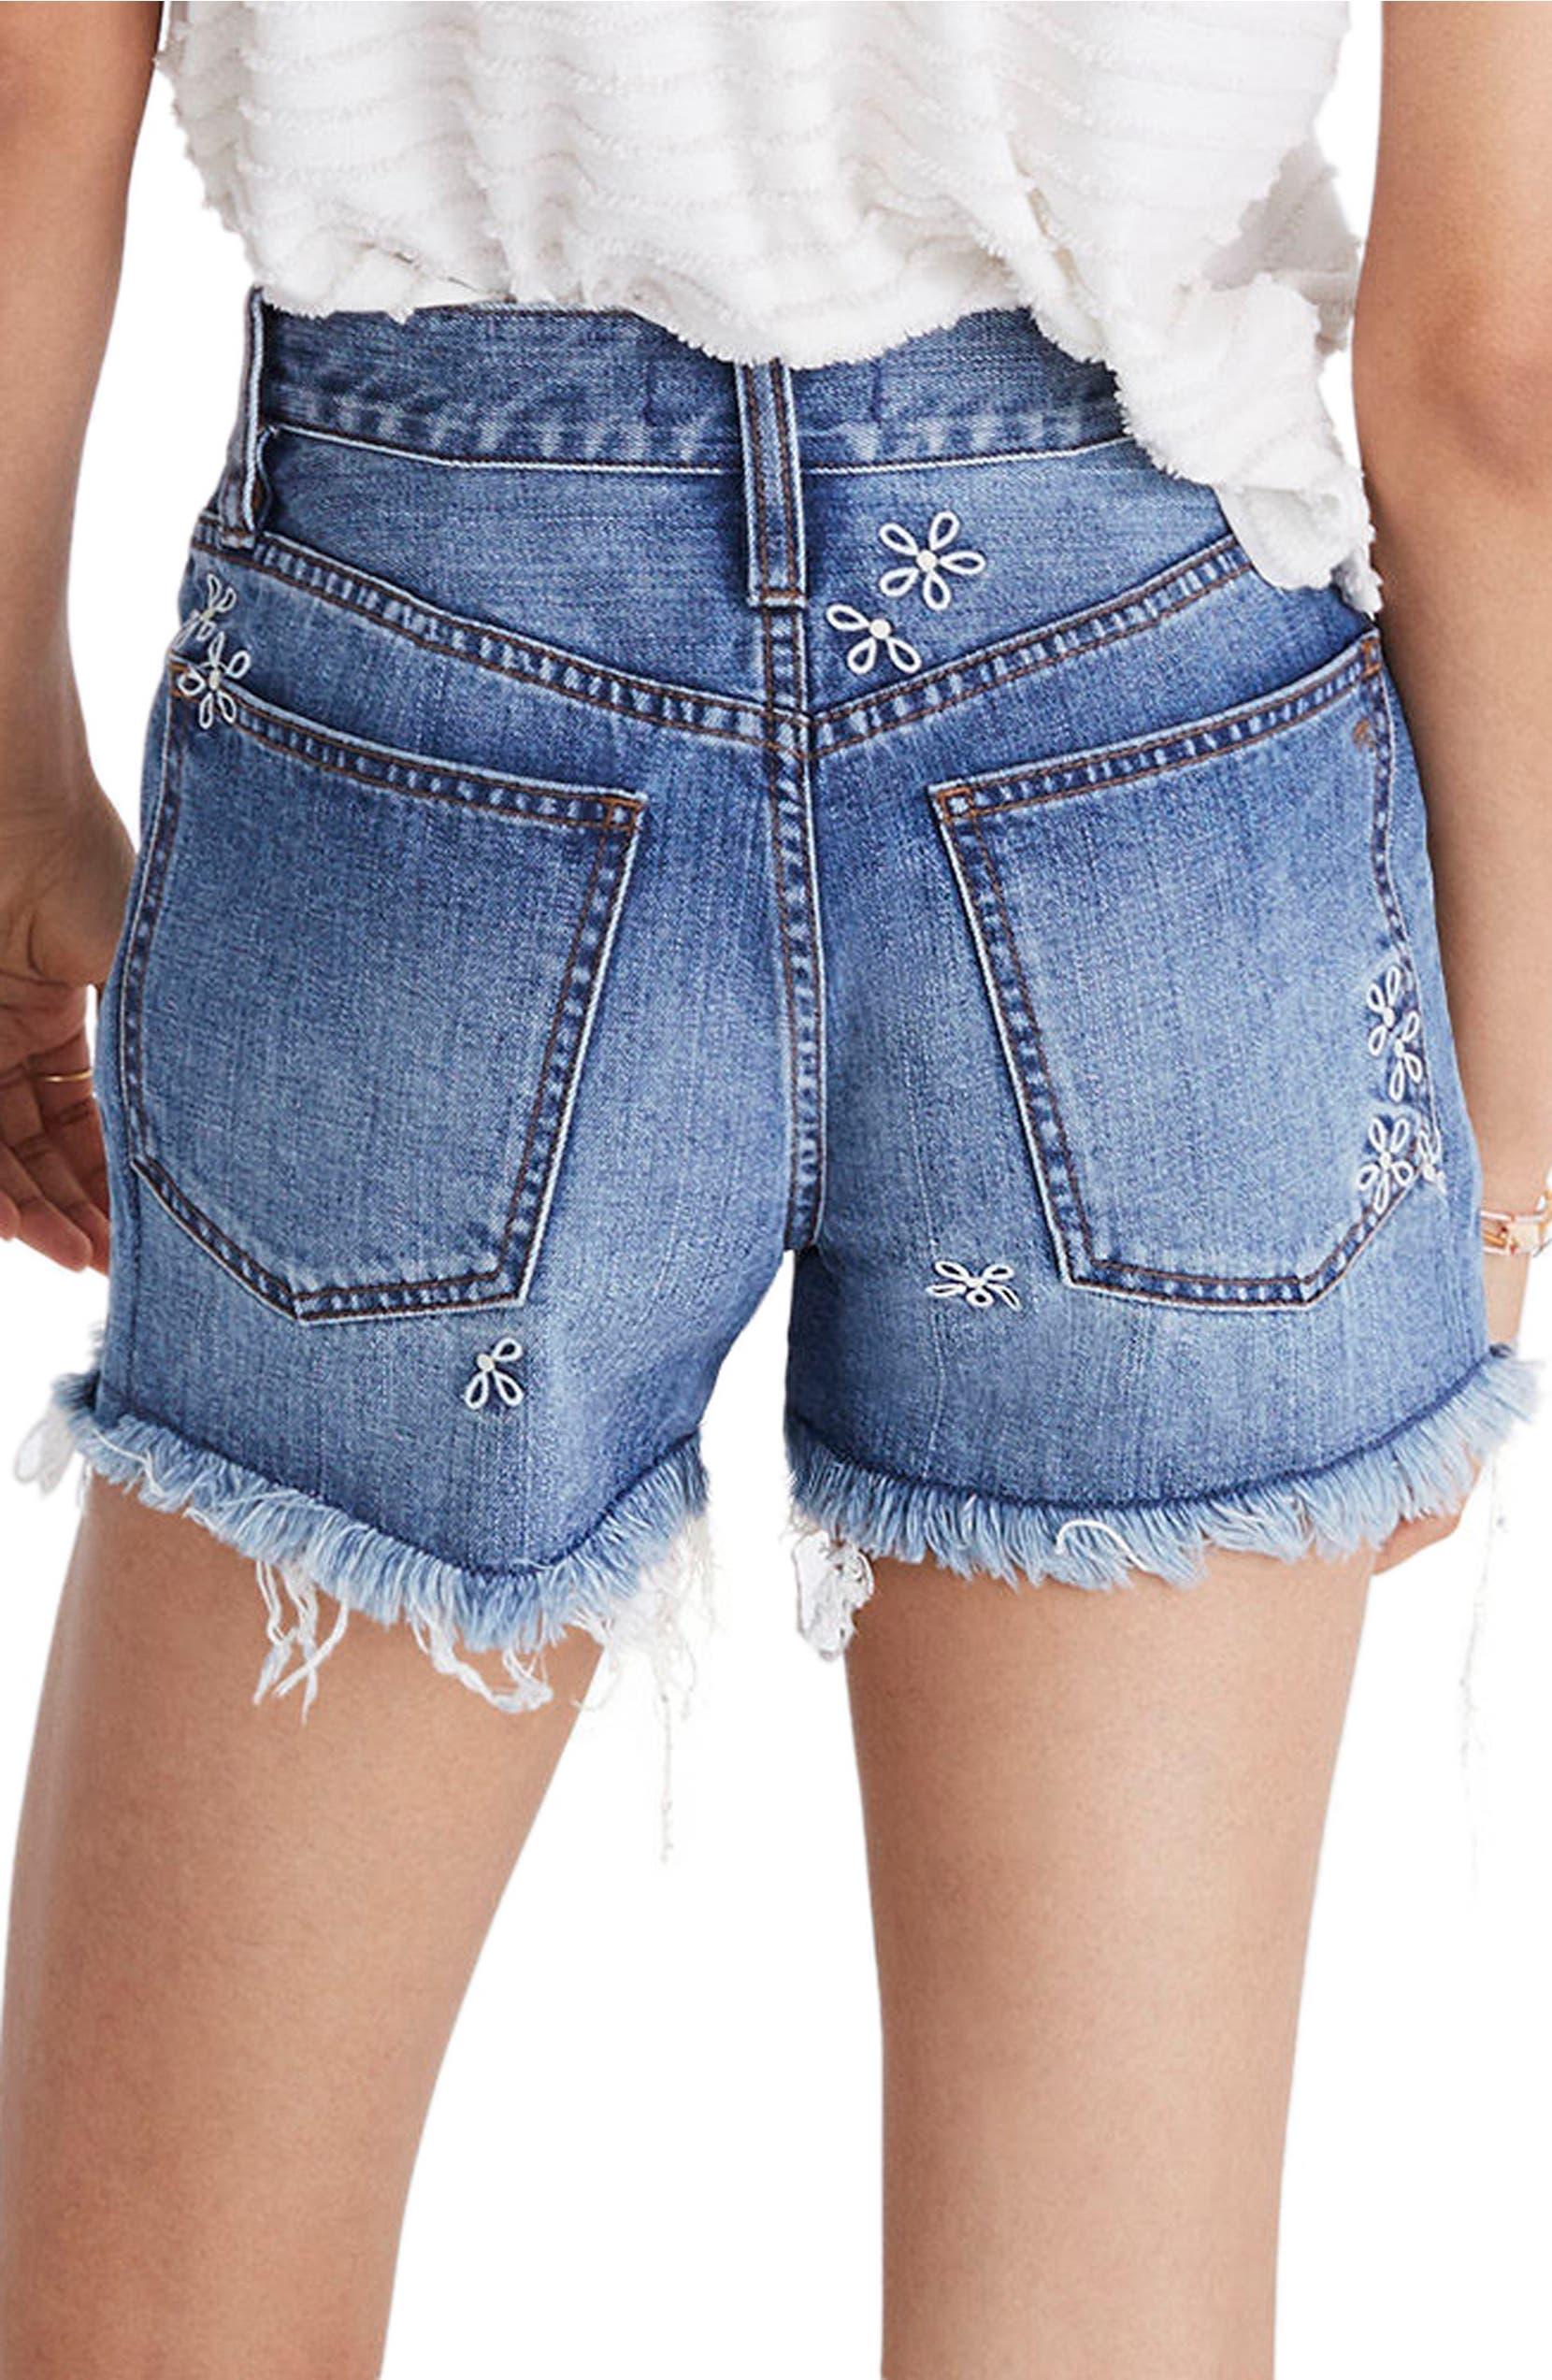 bf736de98a65 Madewell Perfect Daisy Embroidered High Waist Denim Shorts (Aberdeen Wash)  | Nordstrom